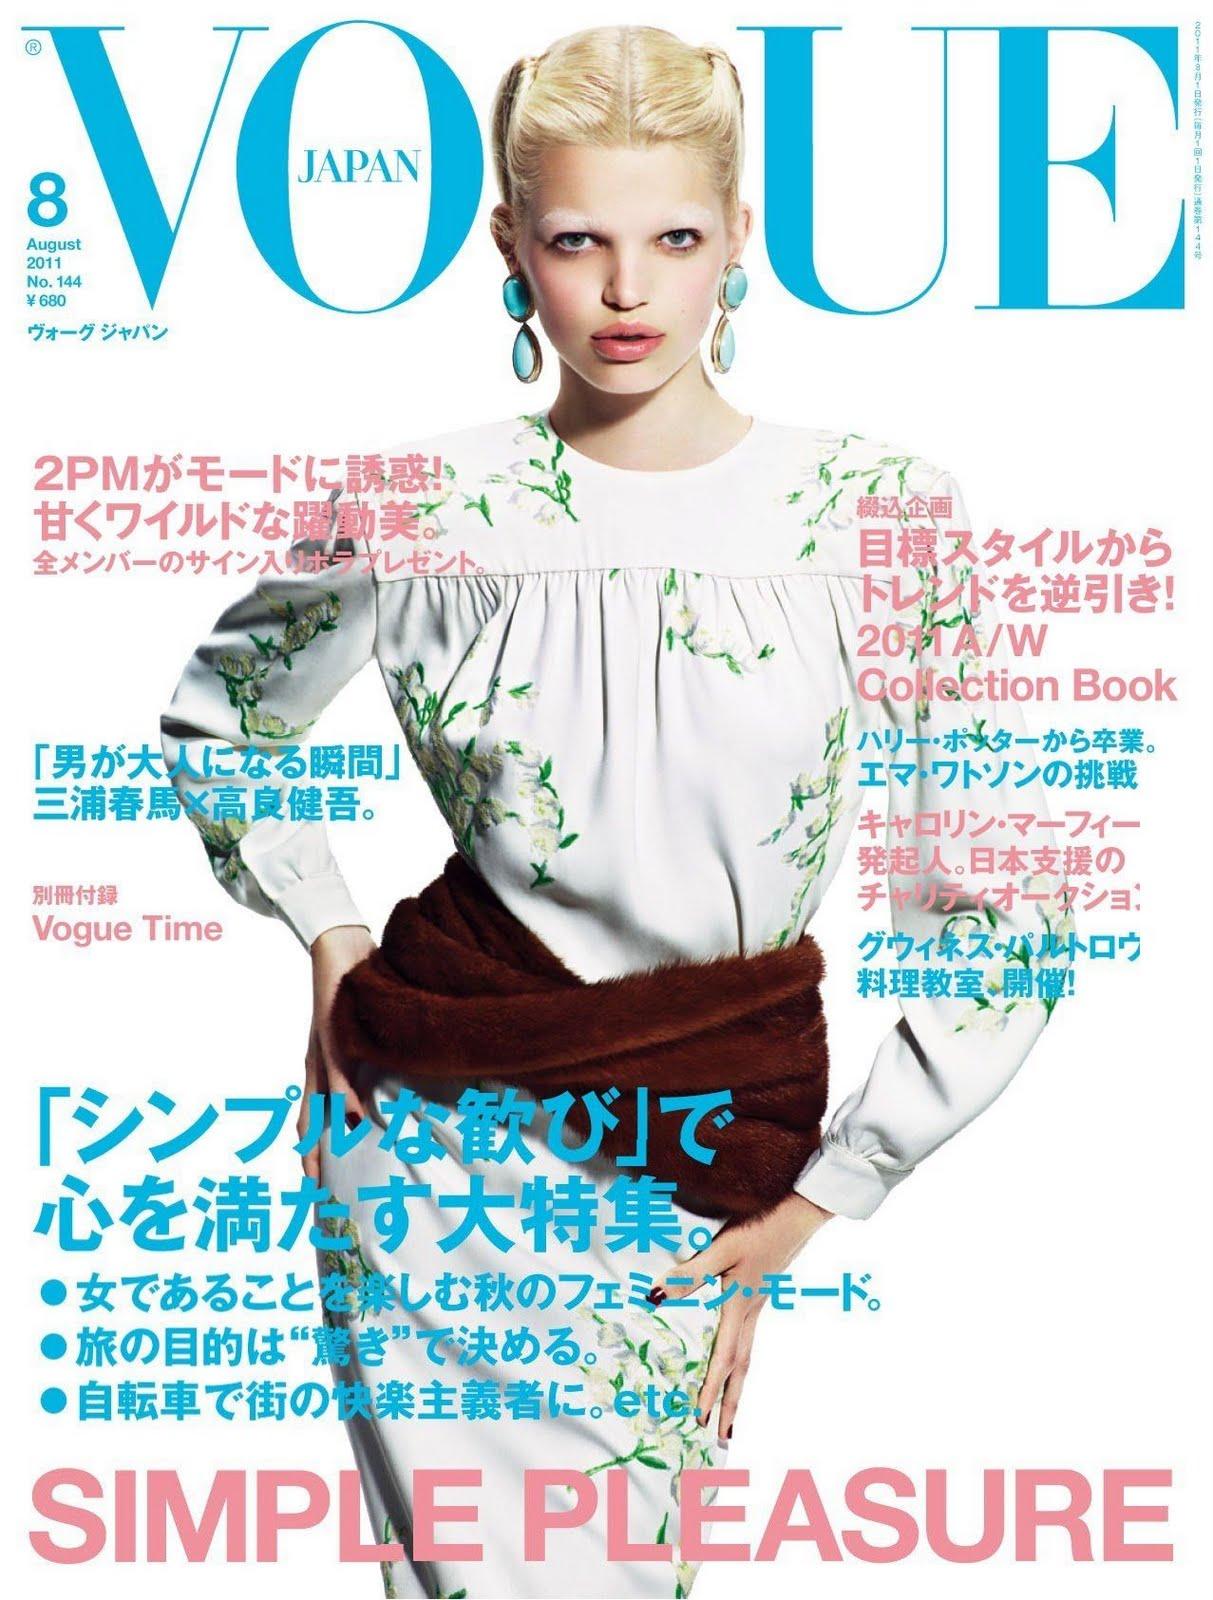 http://2.bp.blogspot.com/-ihtZzOJlRC8/Tf-uSiWI1gI/AAAAAAAAcqg/ezCl64a3TqA/s1600/daphne+groeneveld+mario+sorrenti+vogue+japan+august+2011.jpg